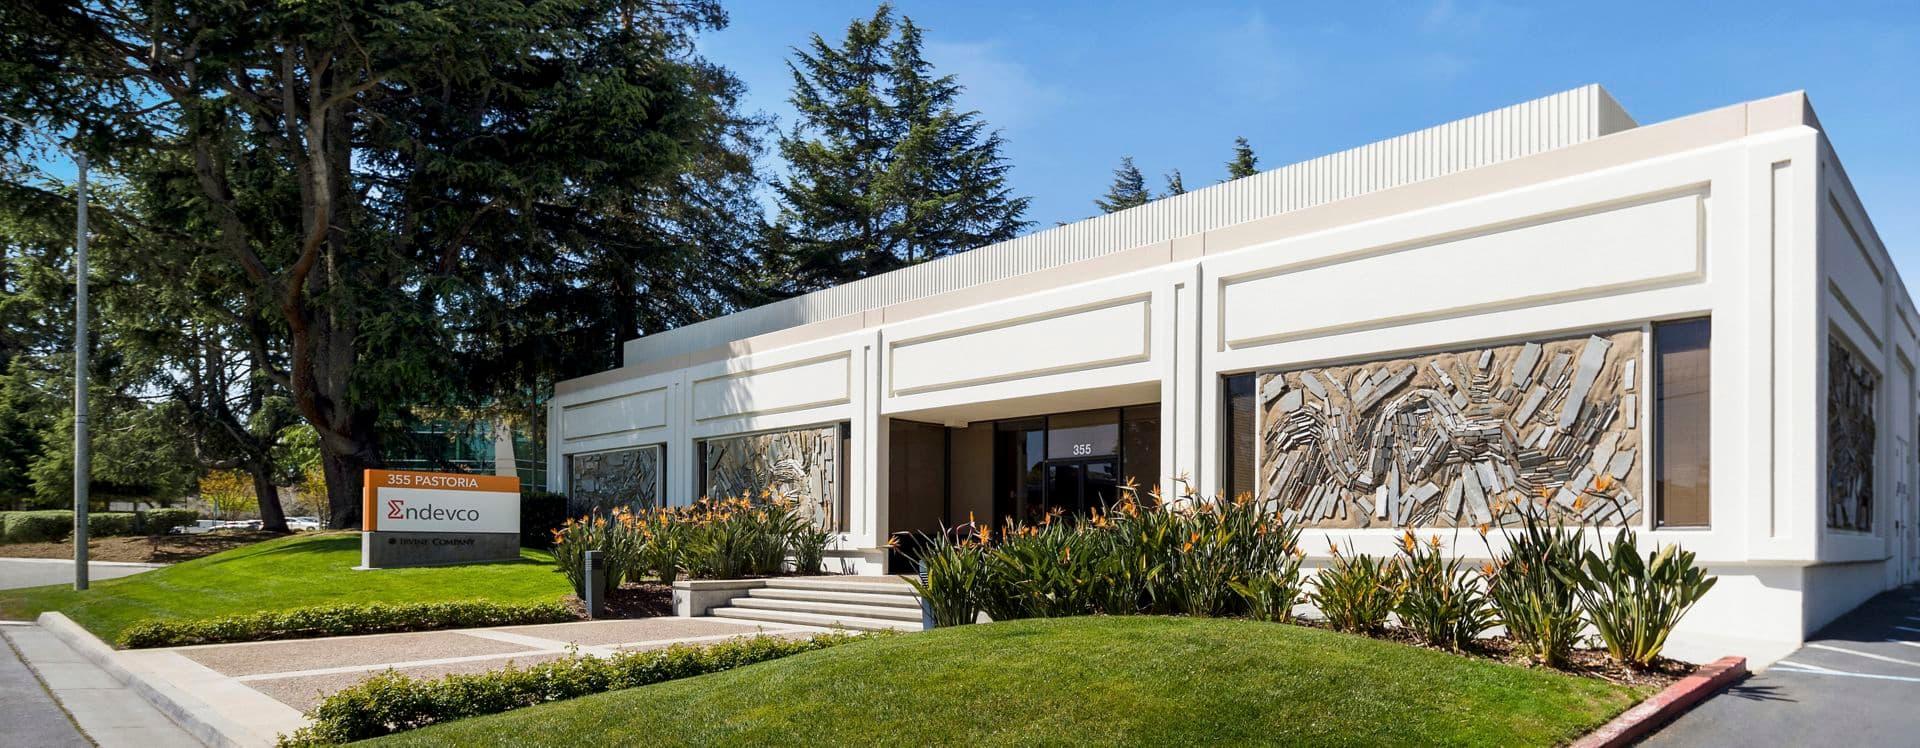 Exterior building photography of 815 Hermosa & 355 Pastoria Ave in 815 Hermosa/355 Pastoria, in Sunnyvale, California.